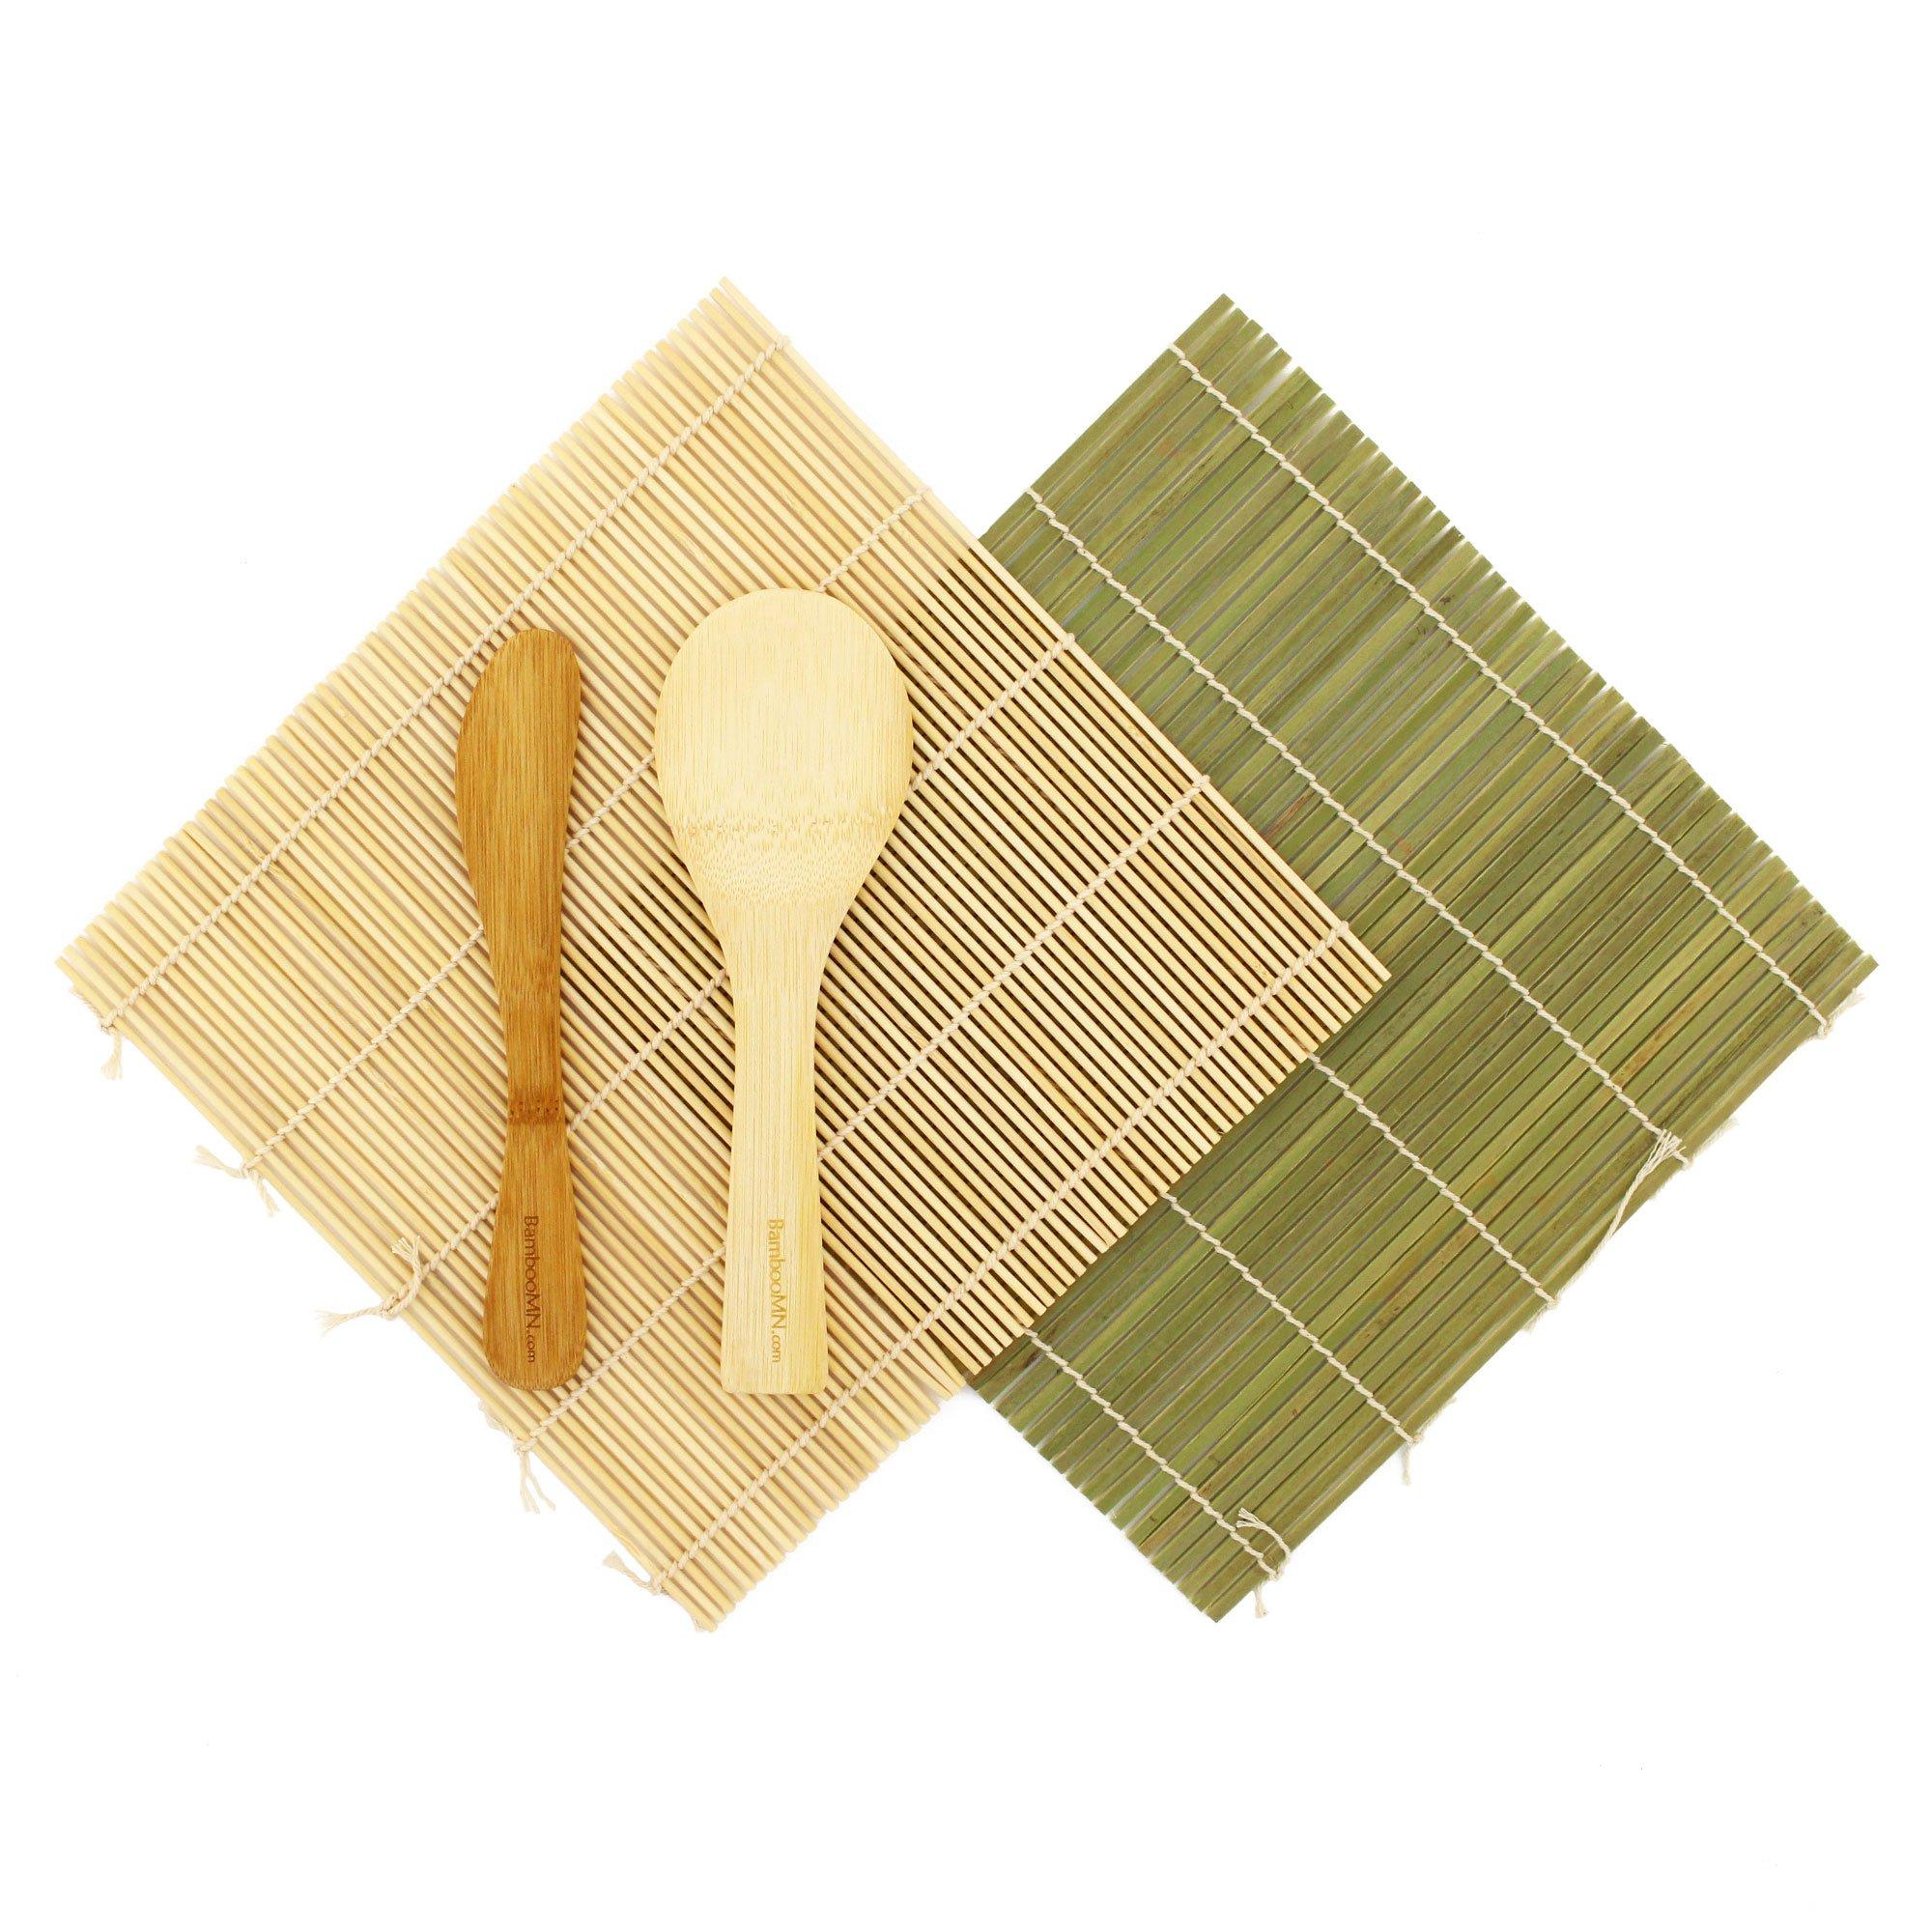 BambooMN Sushi Maker Kit 1x Green 1x Natural Bamboo Rolling Mats, 1x Rice Paddle, 1x Spreader | 100% Bamboo Mats and Utensils